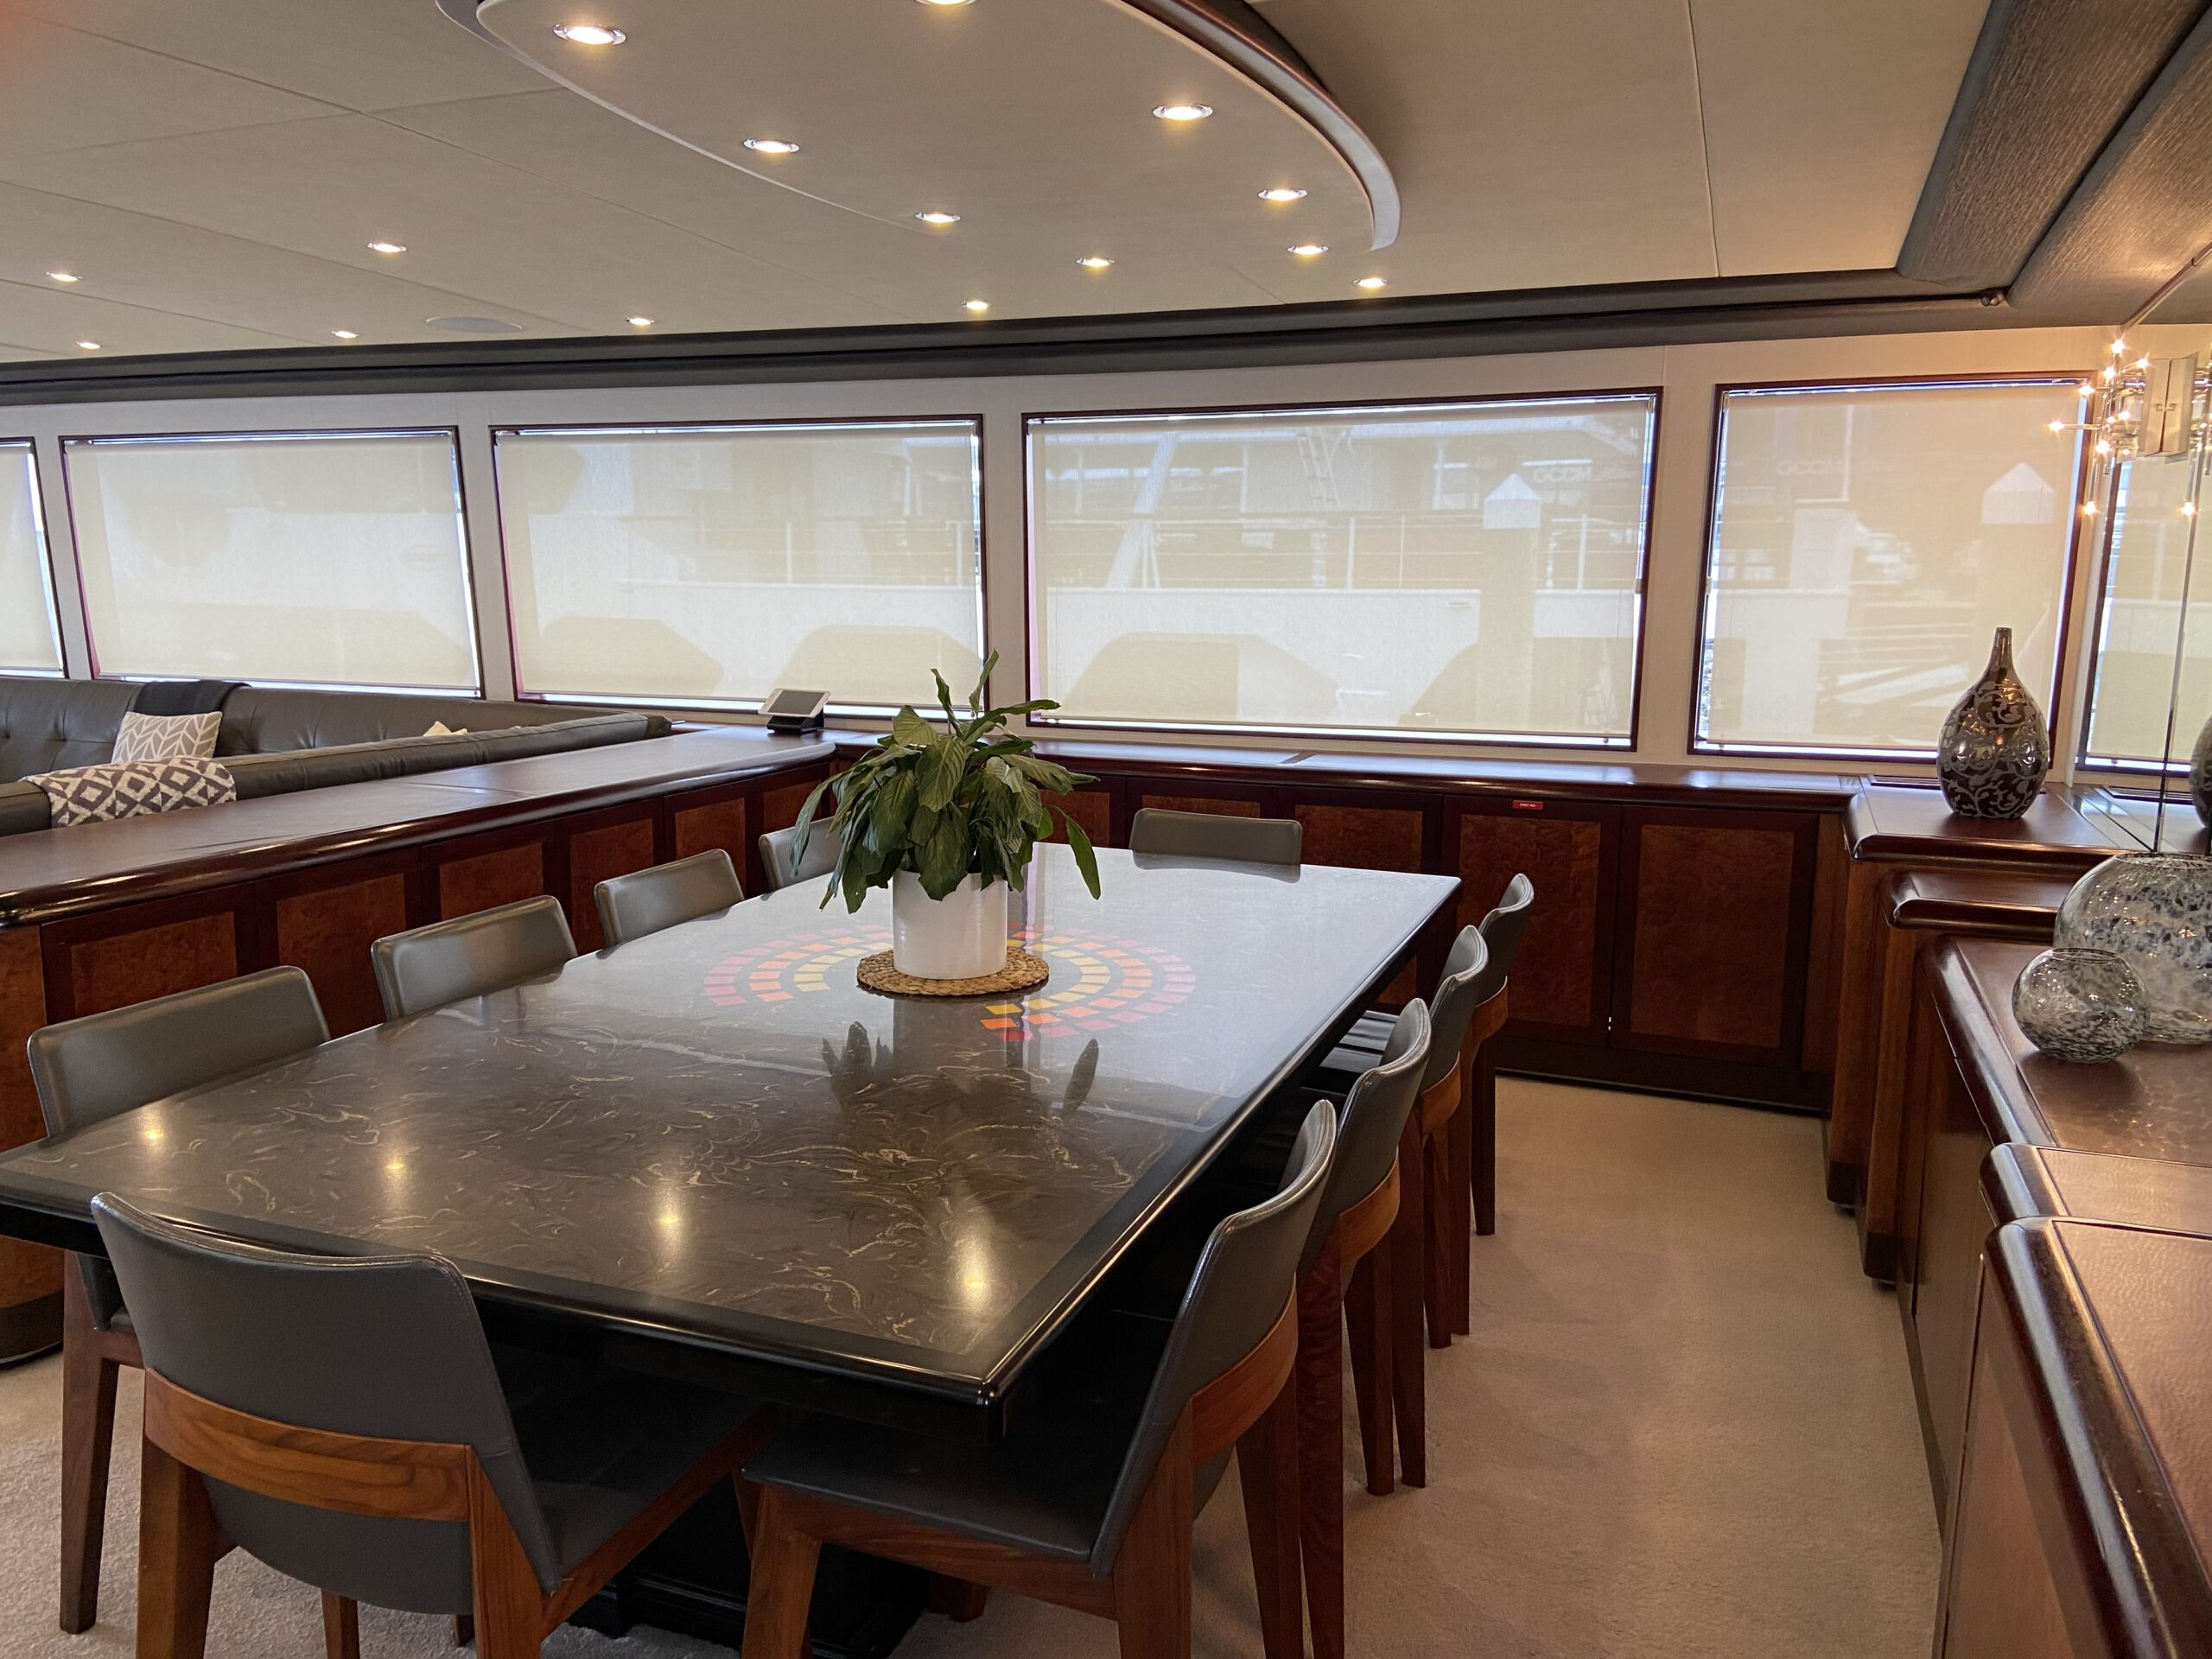 YOTSPACE superyacht voyages - Corroboree Dining room